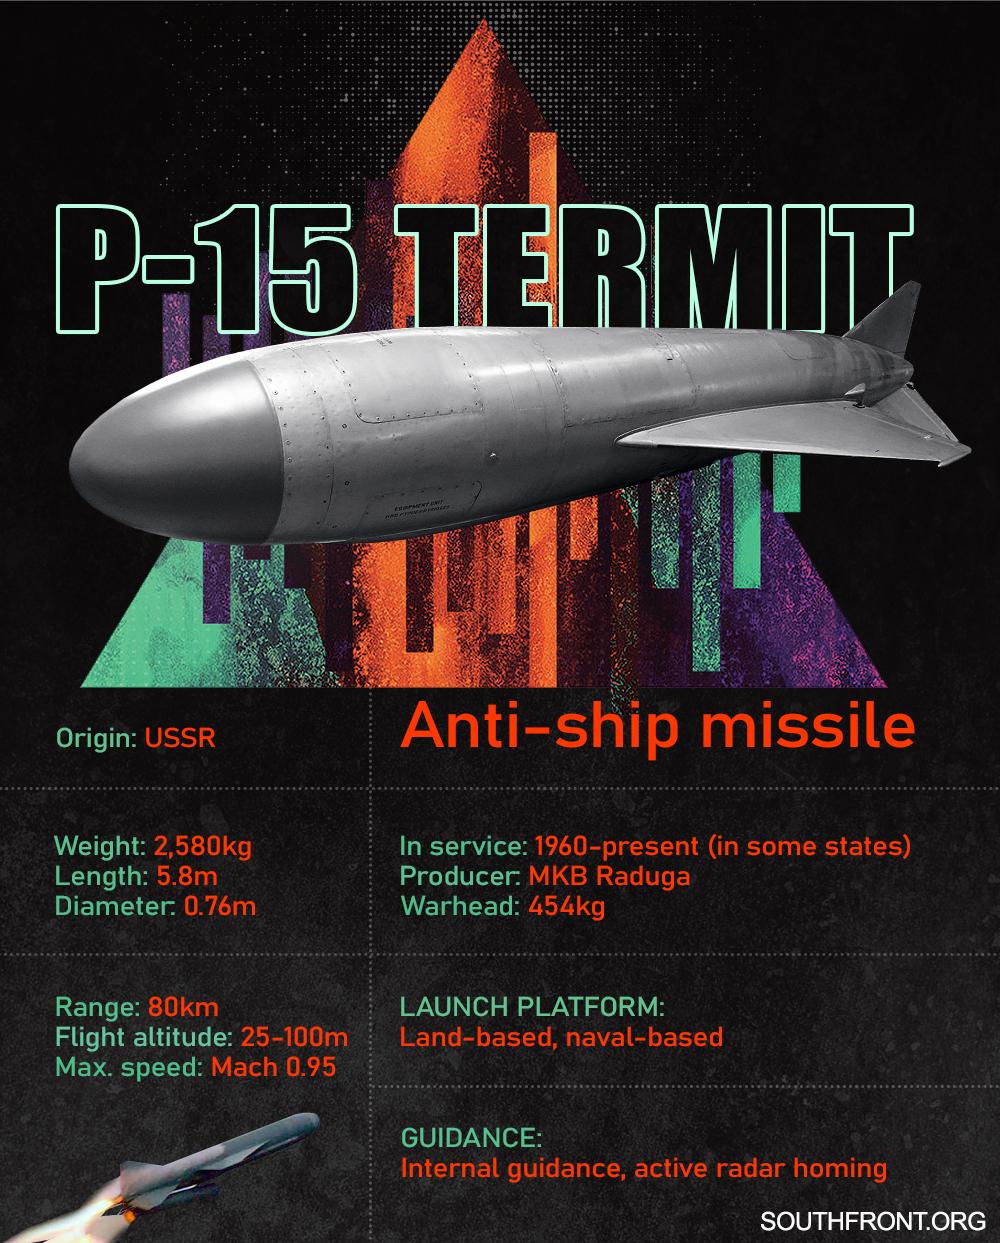 P-15 Termit Anti-Ship Missile (Infographics)